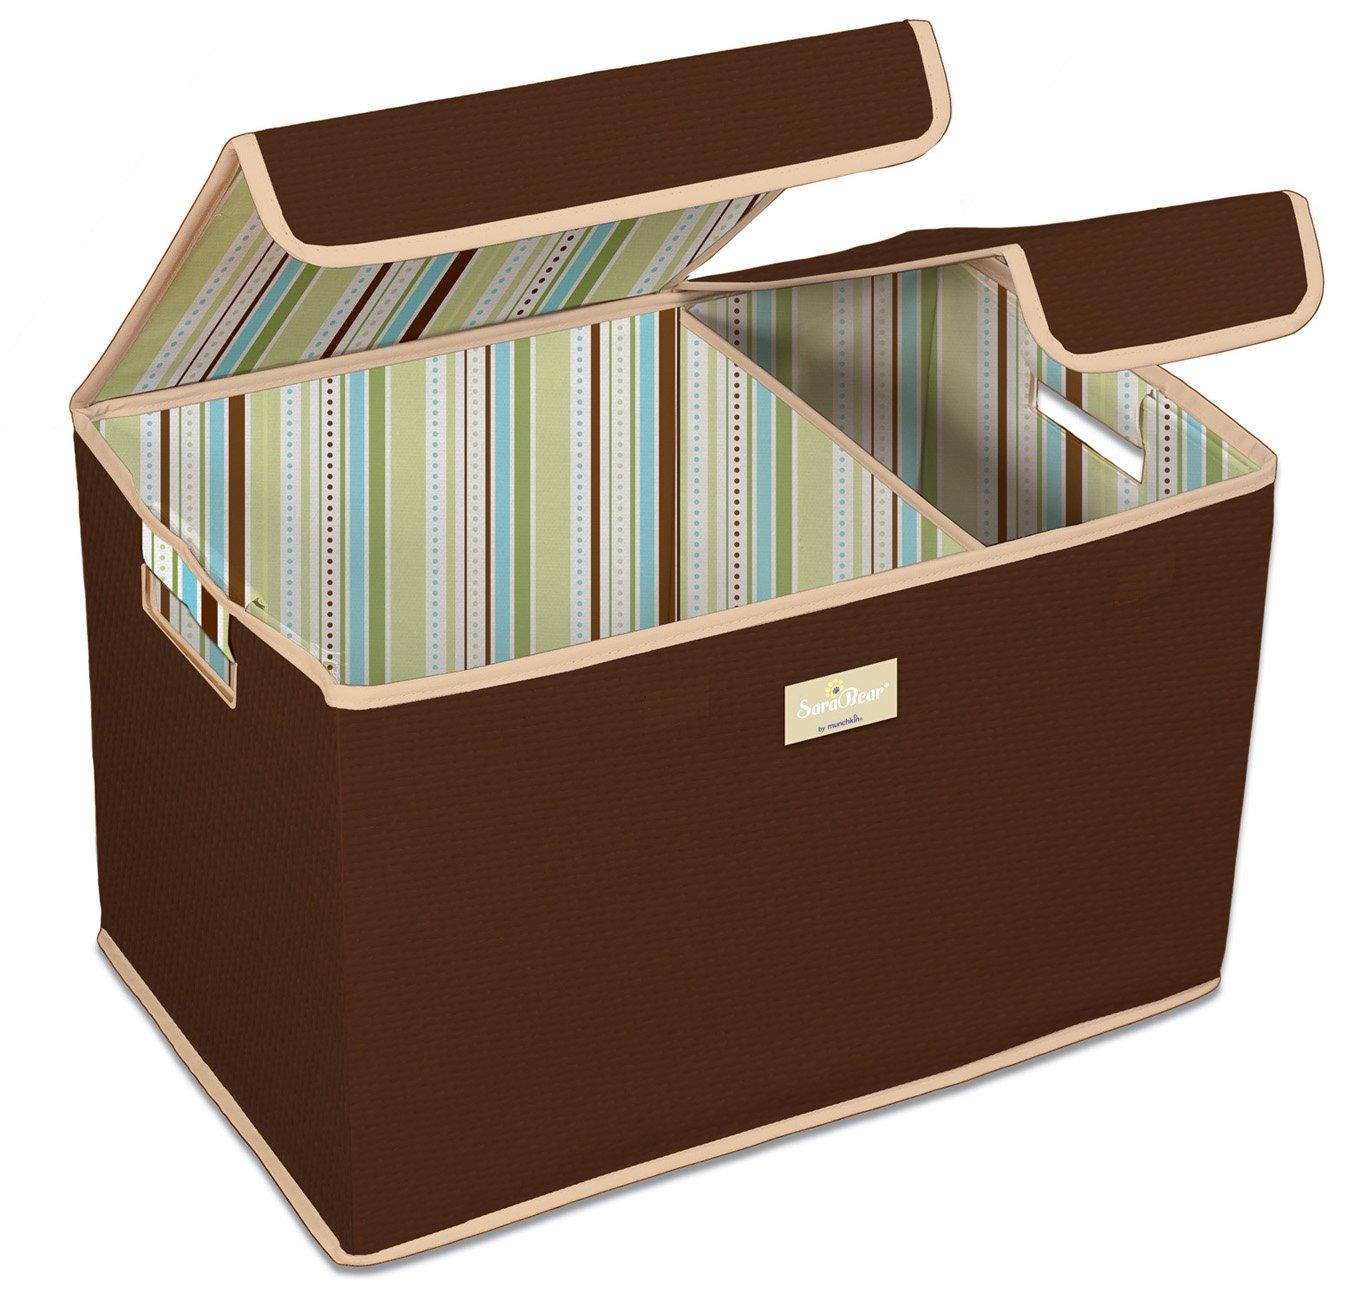 Amazon.com : Munchkin SaraBear Toy Organizer, Brown, Large (Older ...